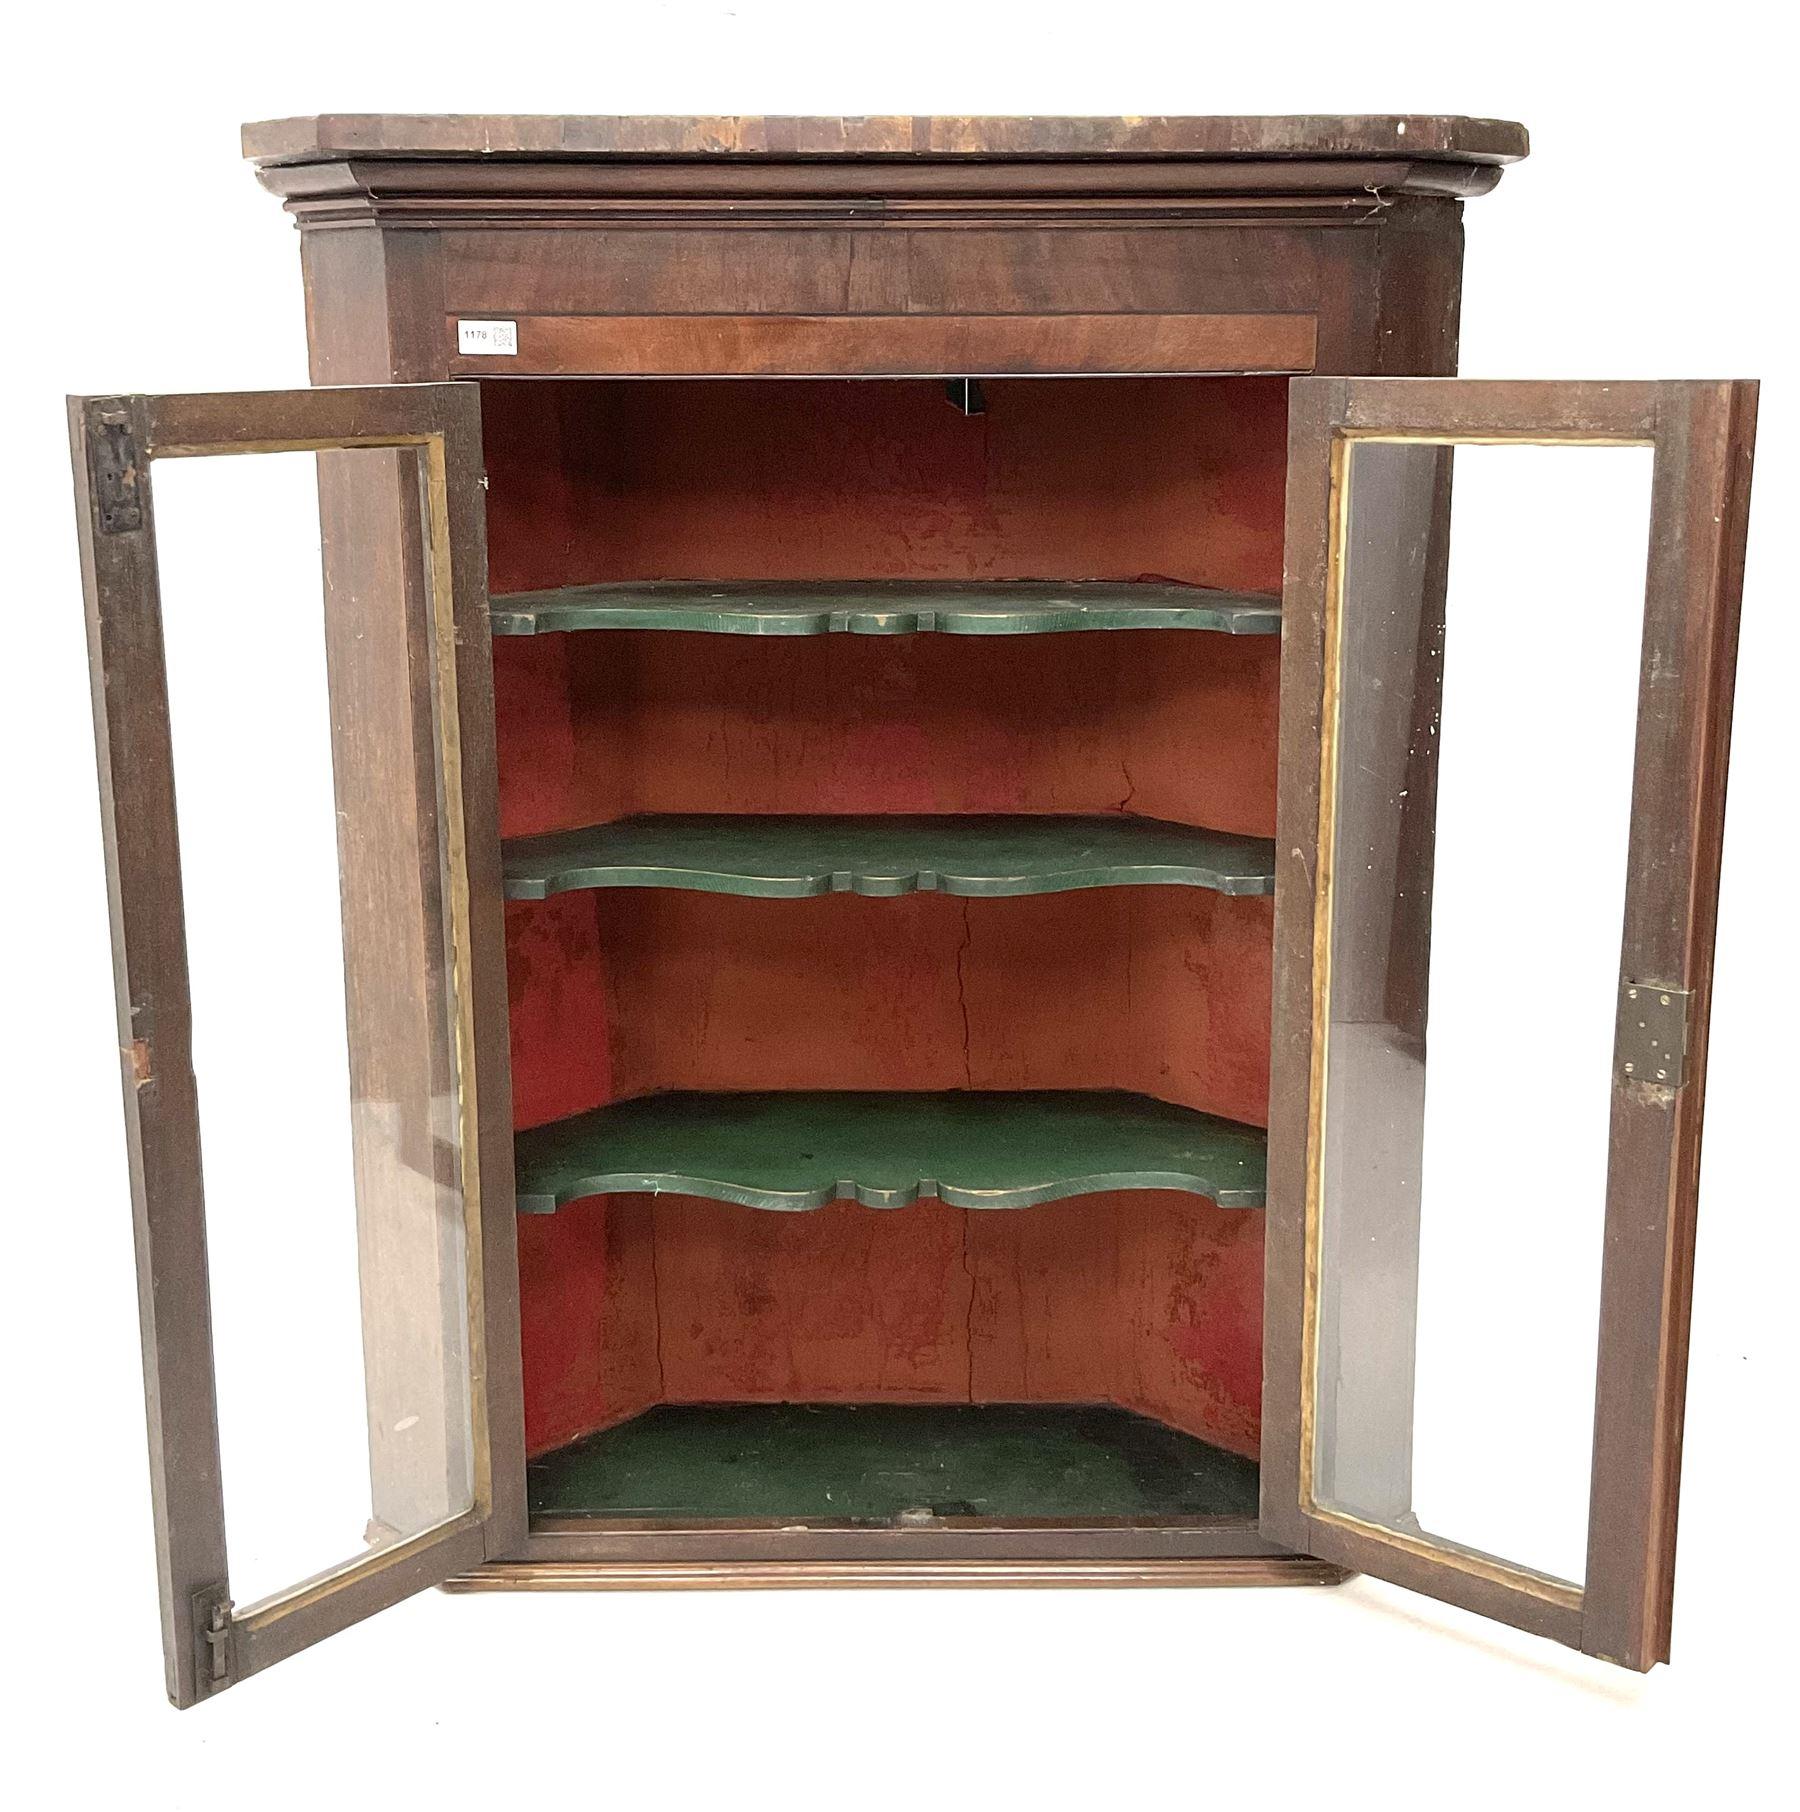 19th century mahogany hanging corner cabinet - Image 2 of 3